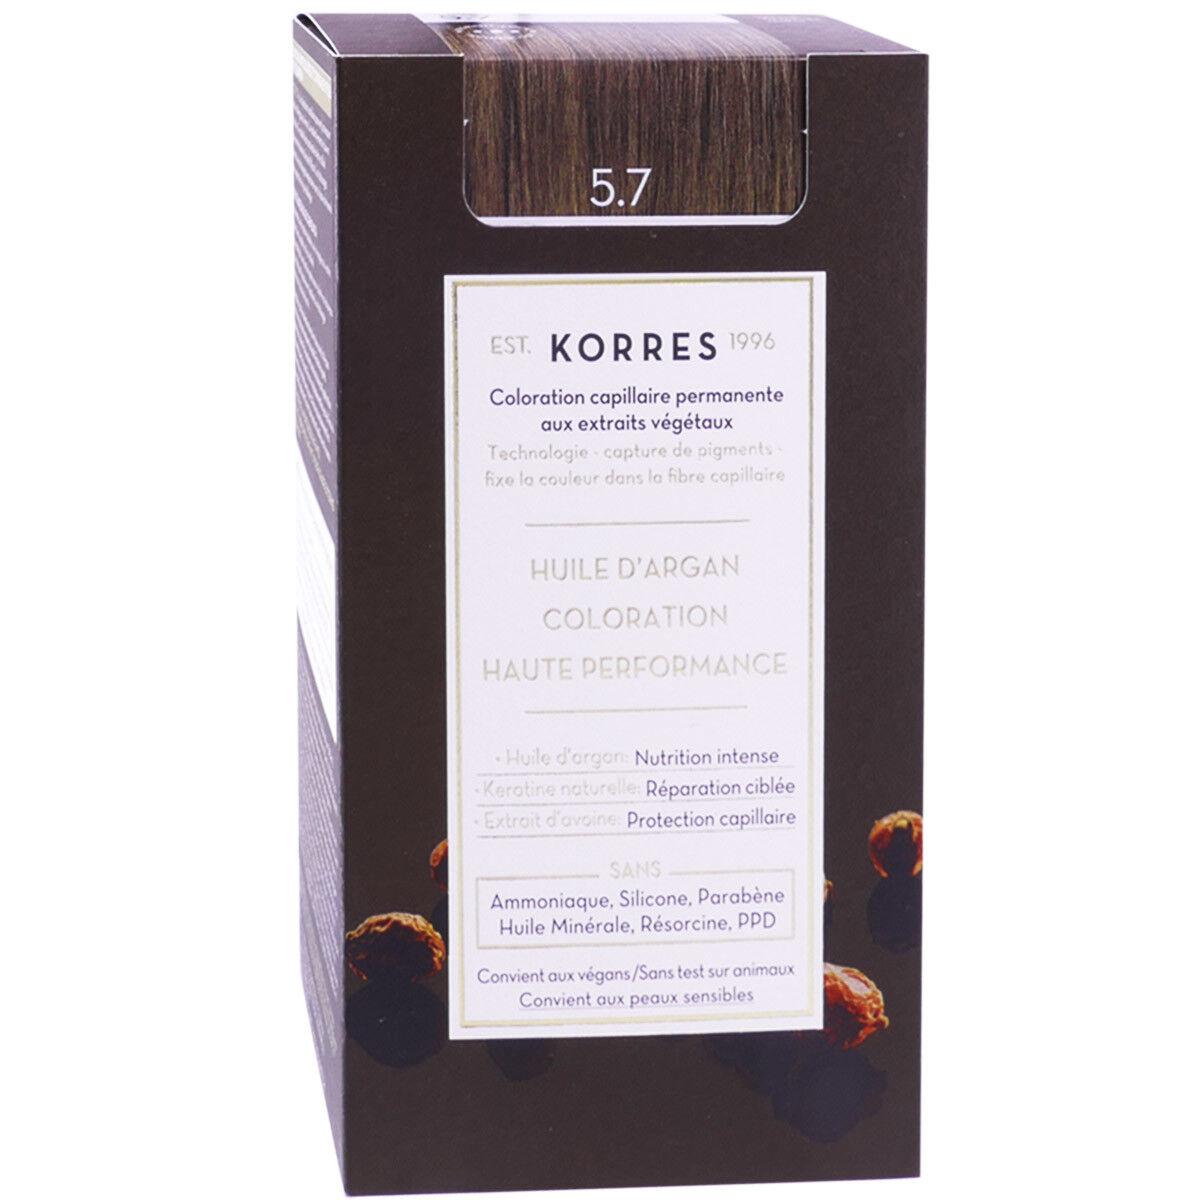 Korres coloration permanente huile argan chocolate 5.7